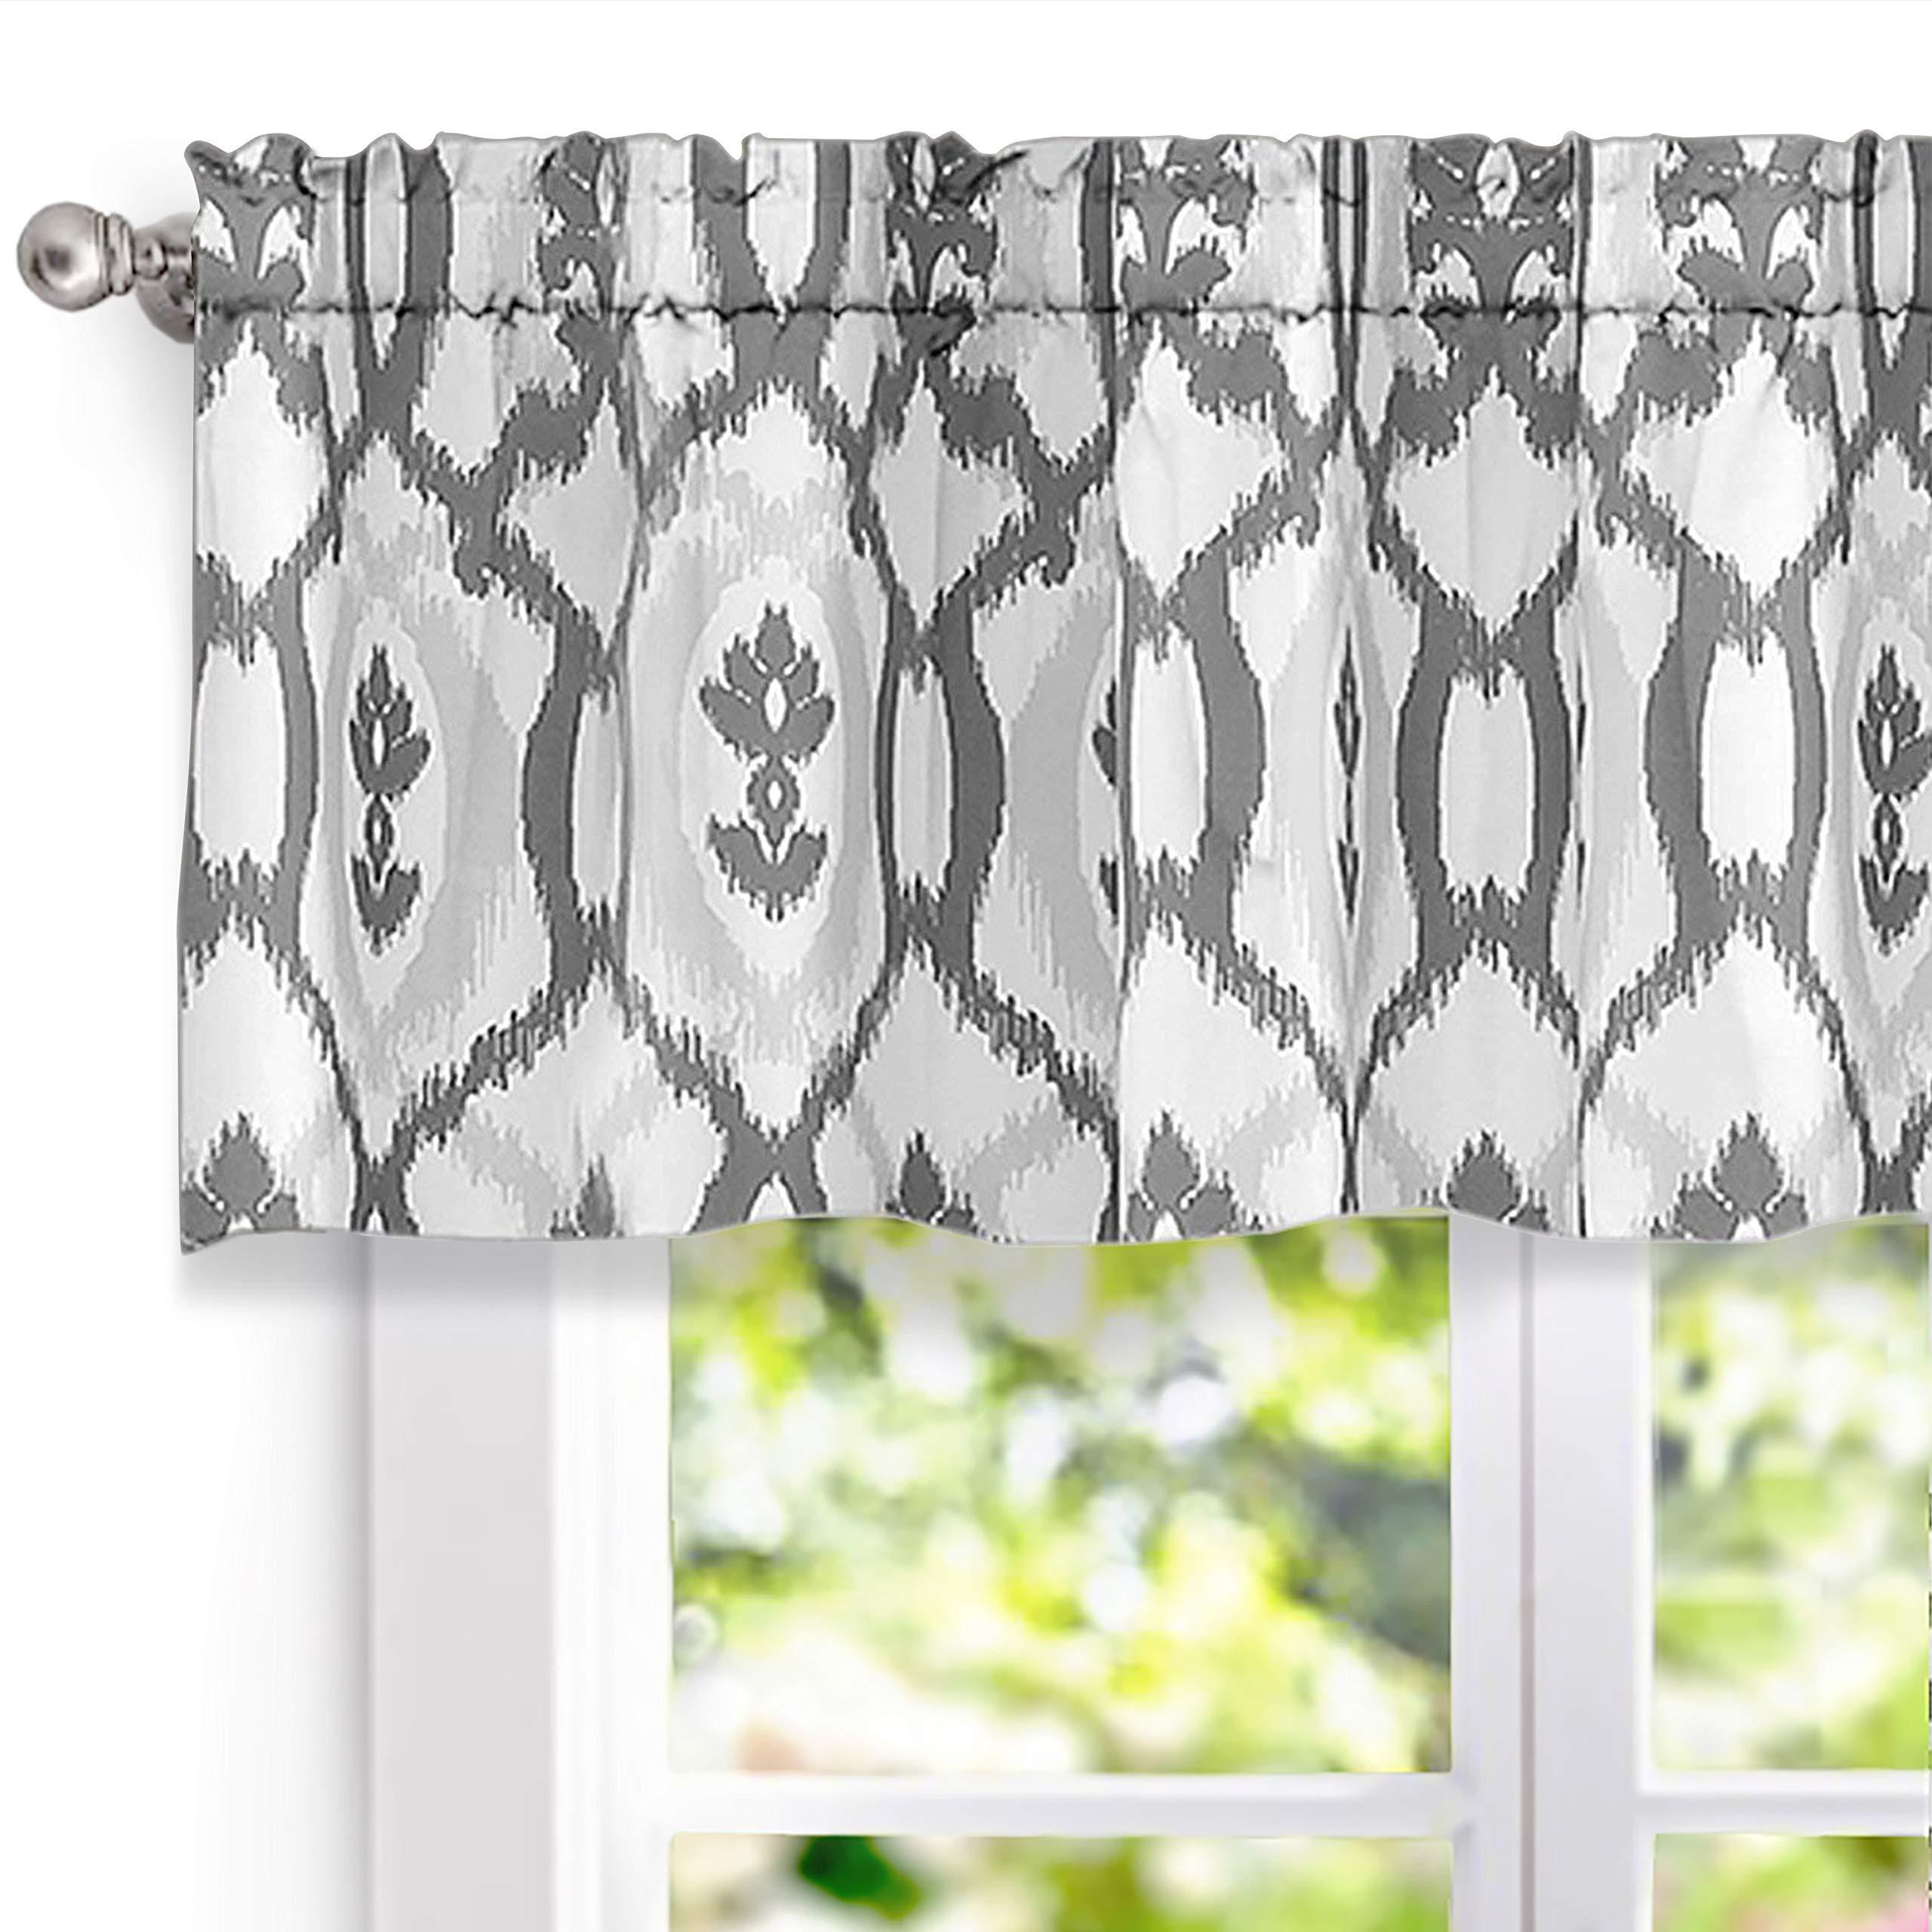 DriftAway Evelyn Ikat Fleur/Floral Pattern Window Curtain Valance, 52''x18'' (Gray)